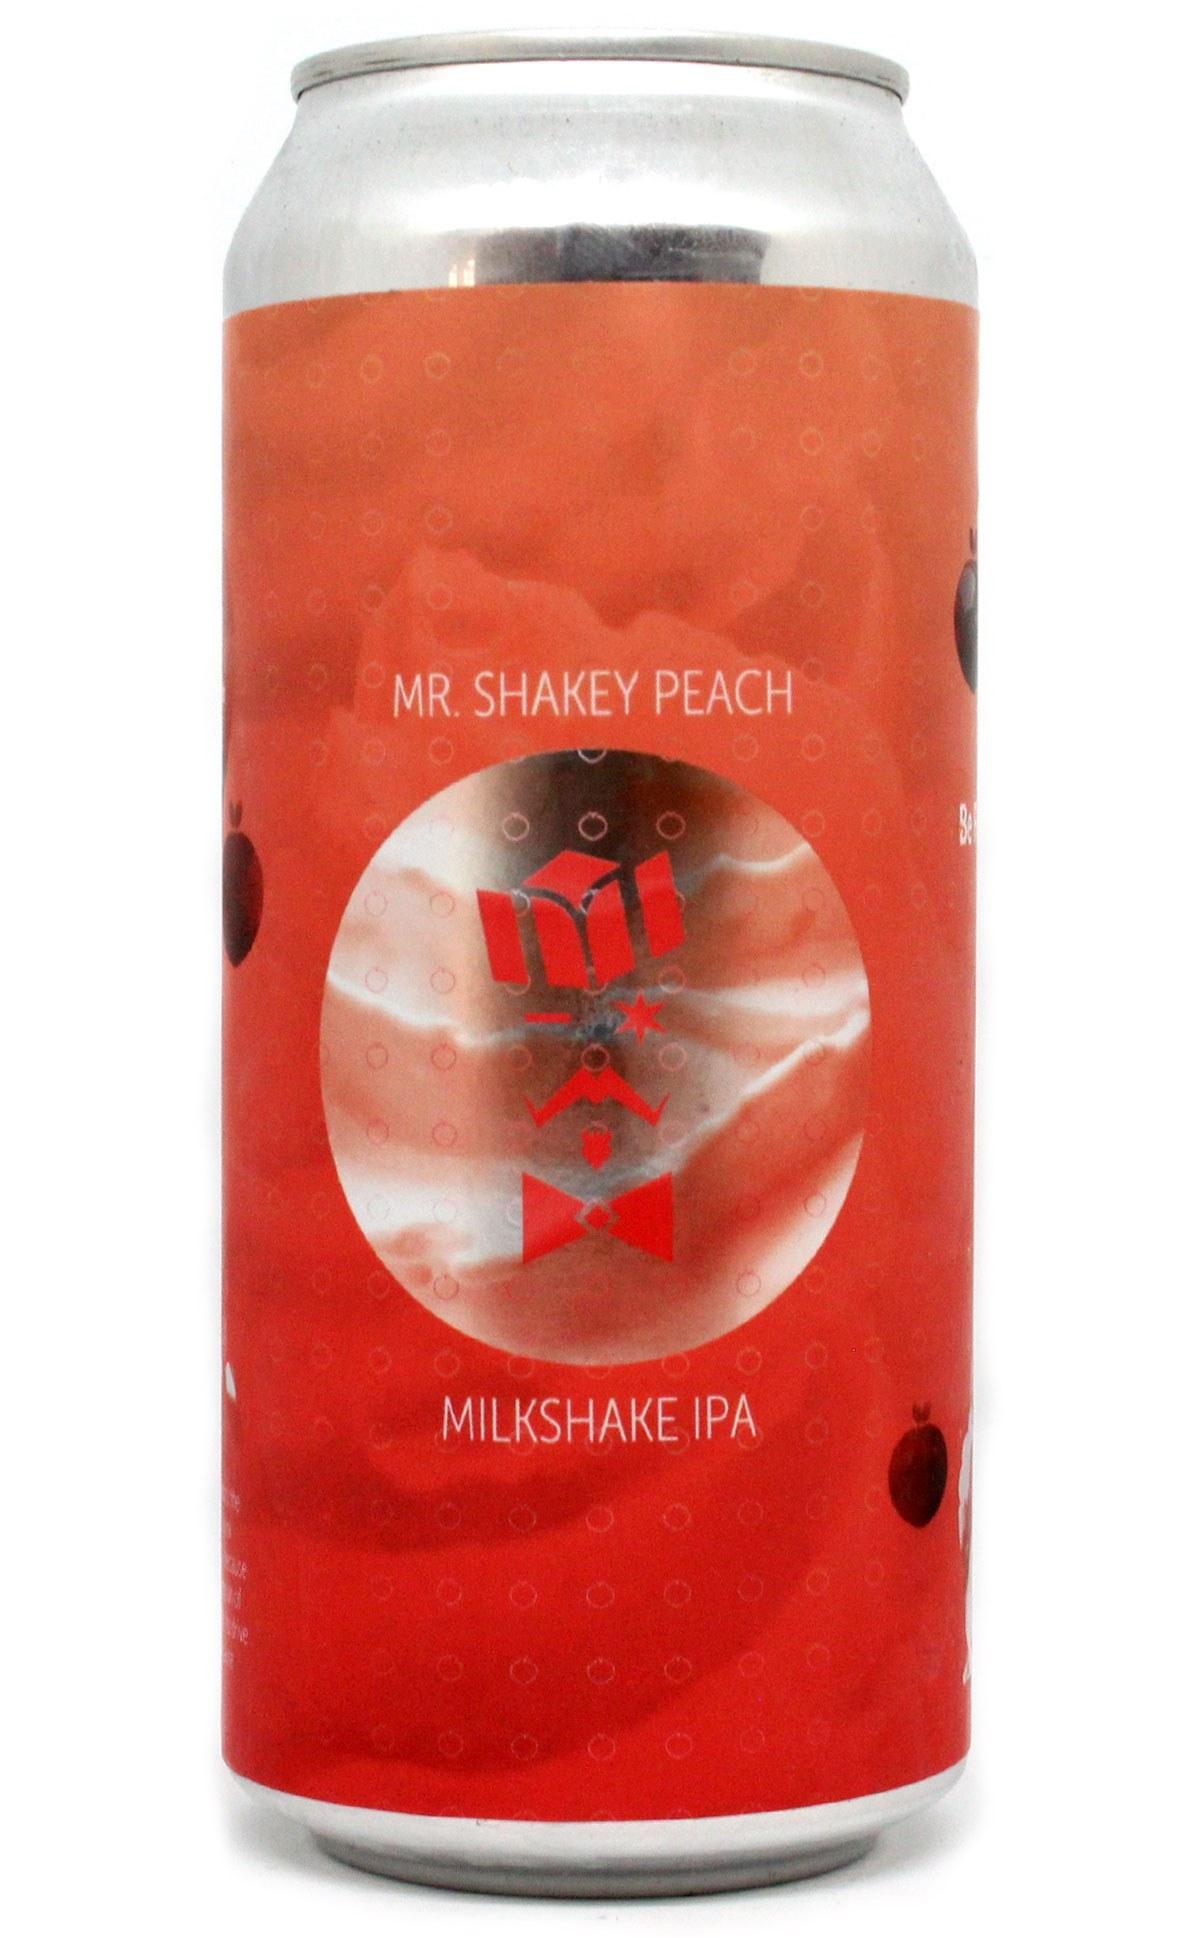 Mr. Shakey Peach